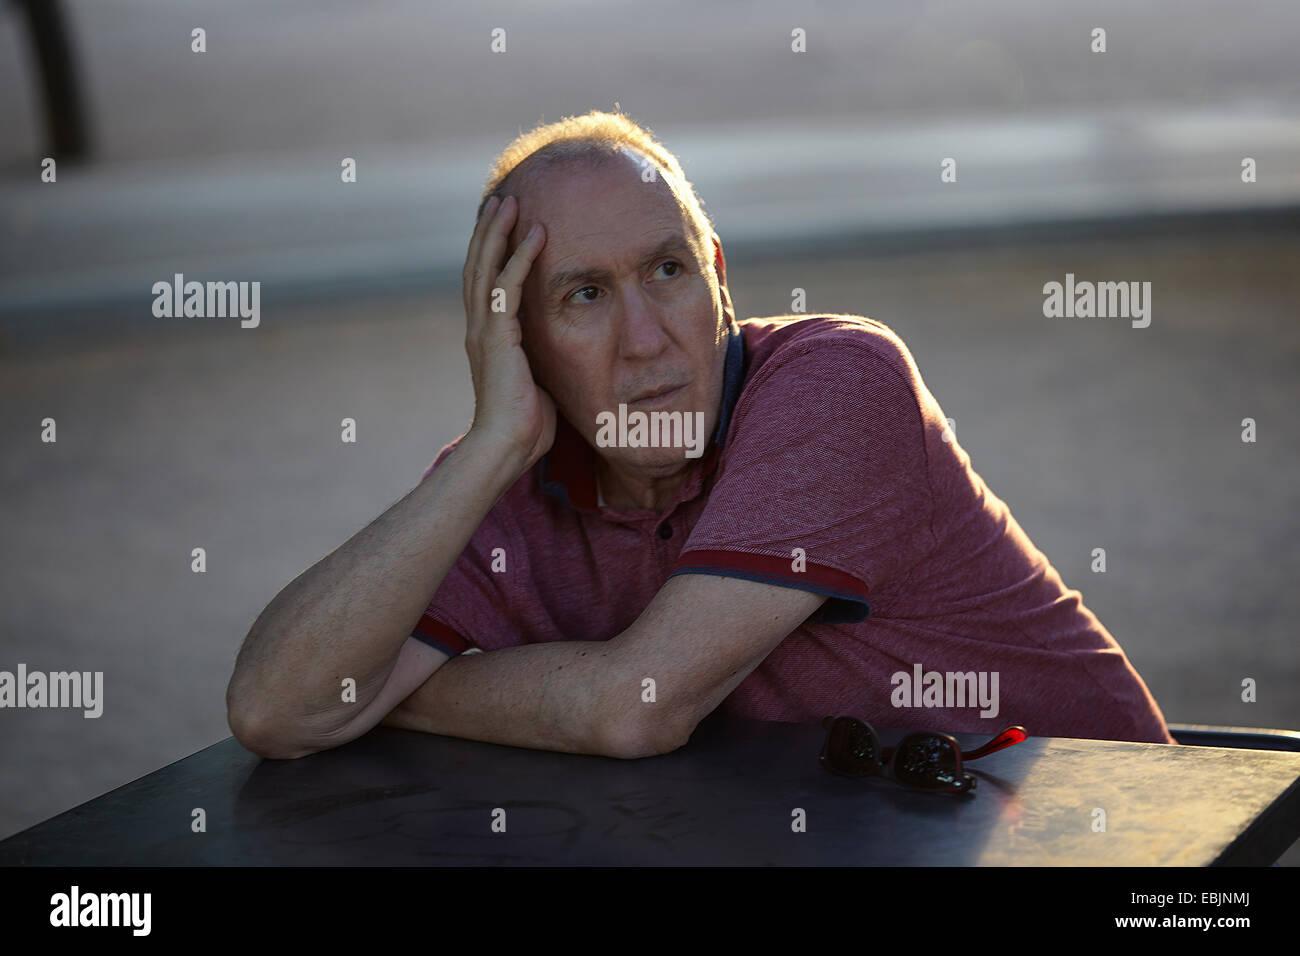 Senior man sitting at table, resting on elbow - Stock Image